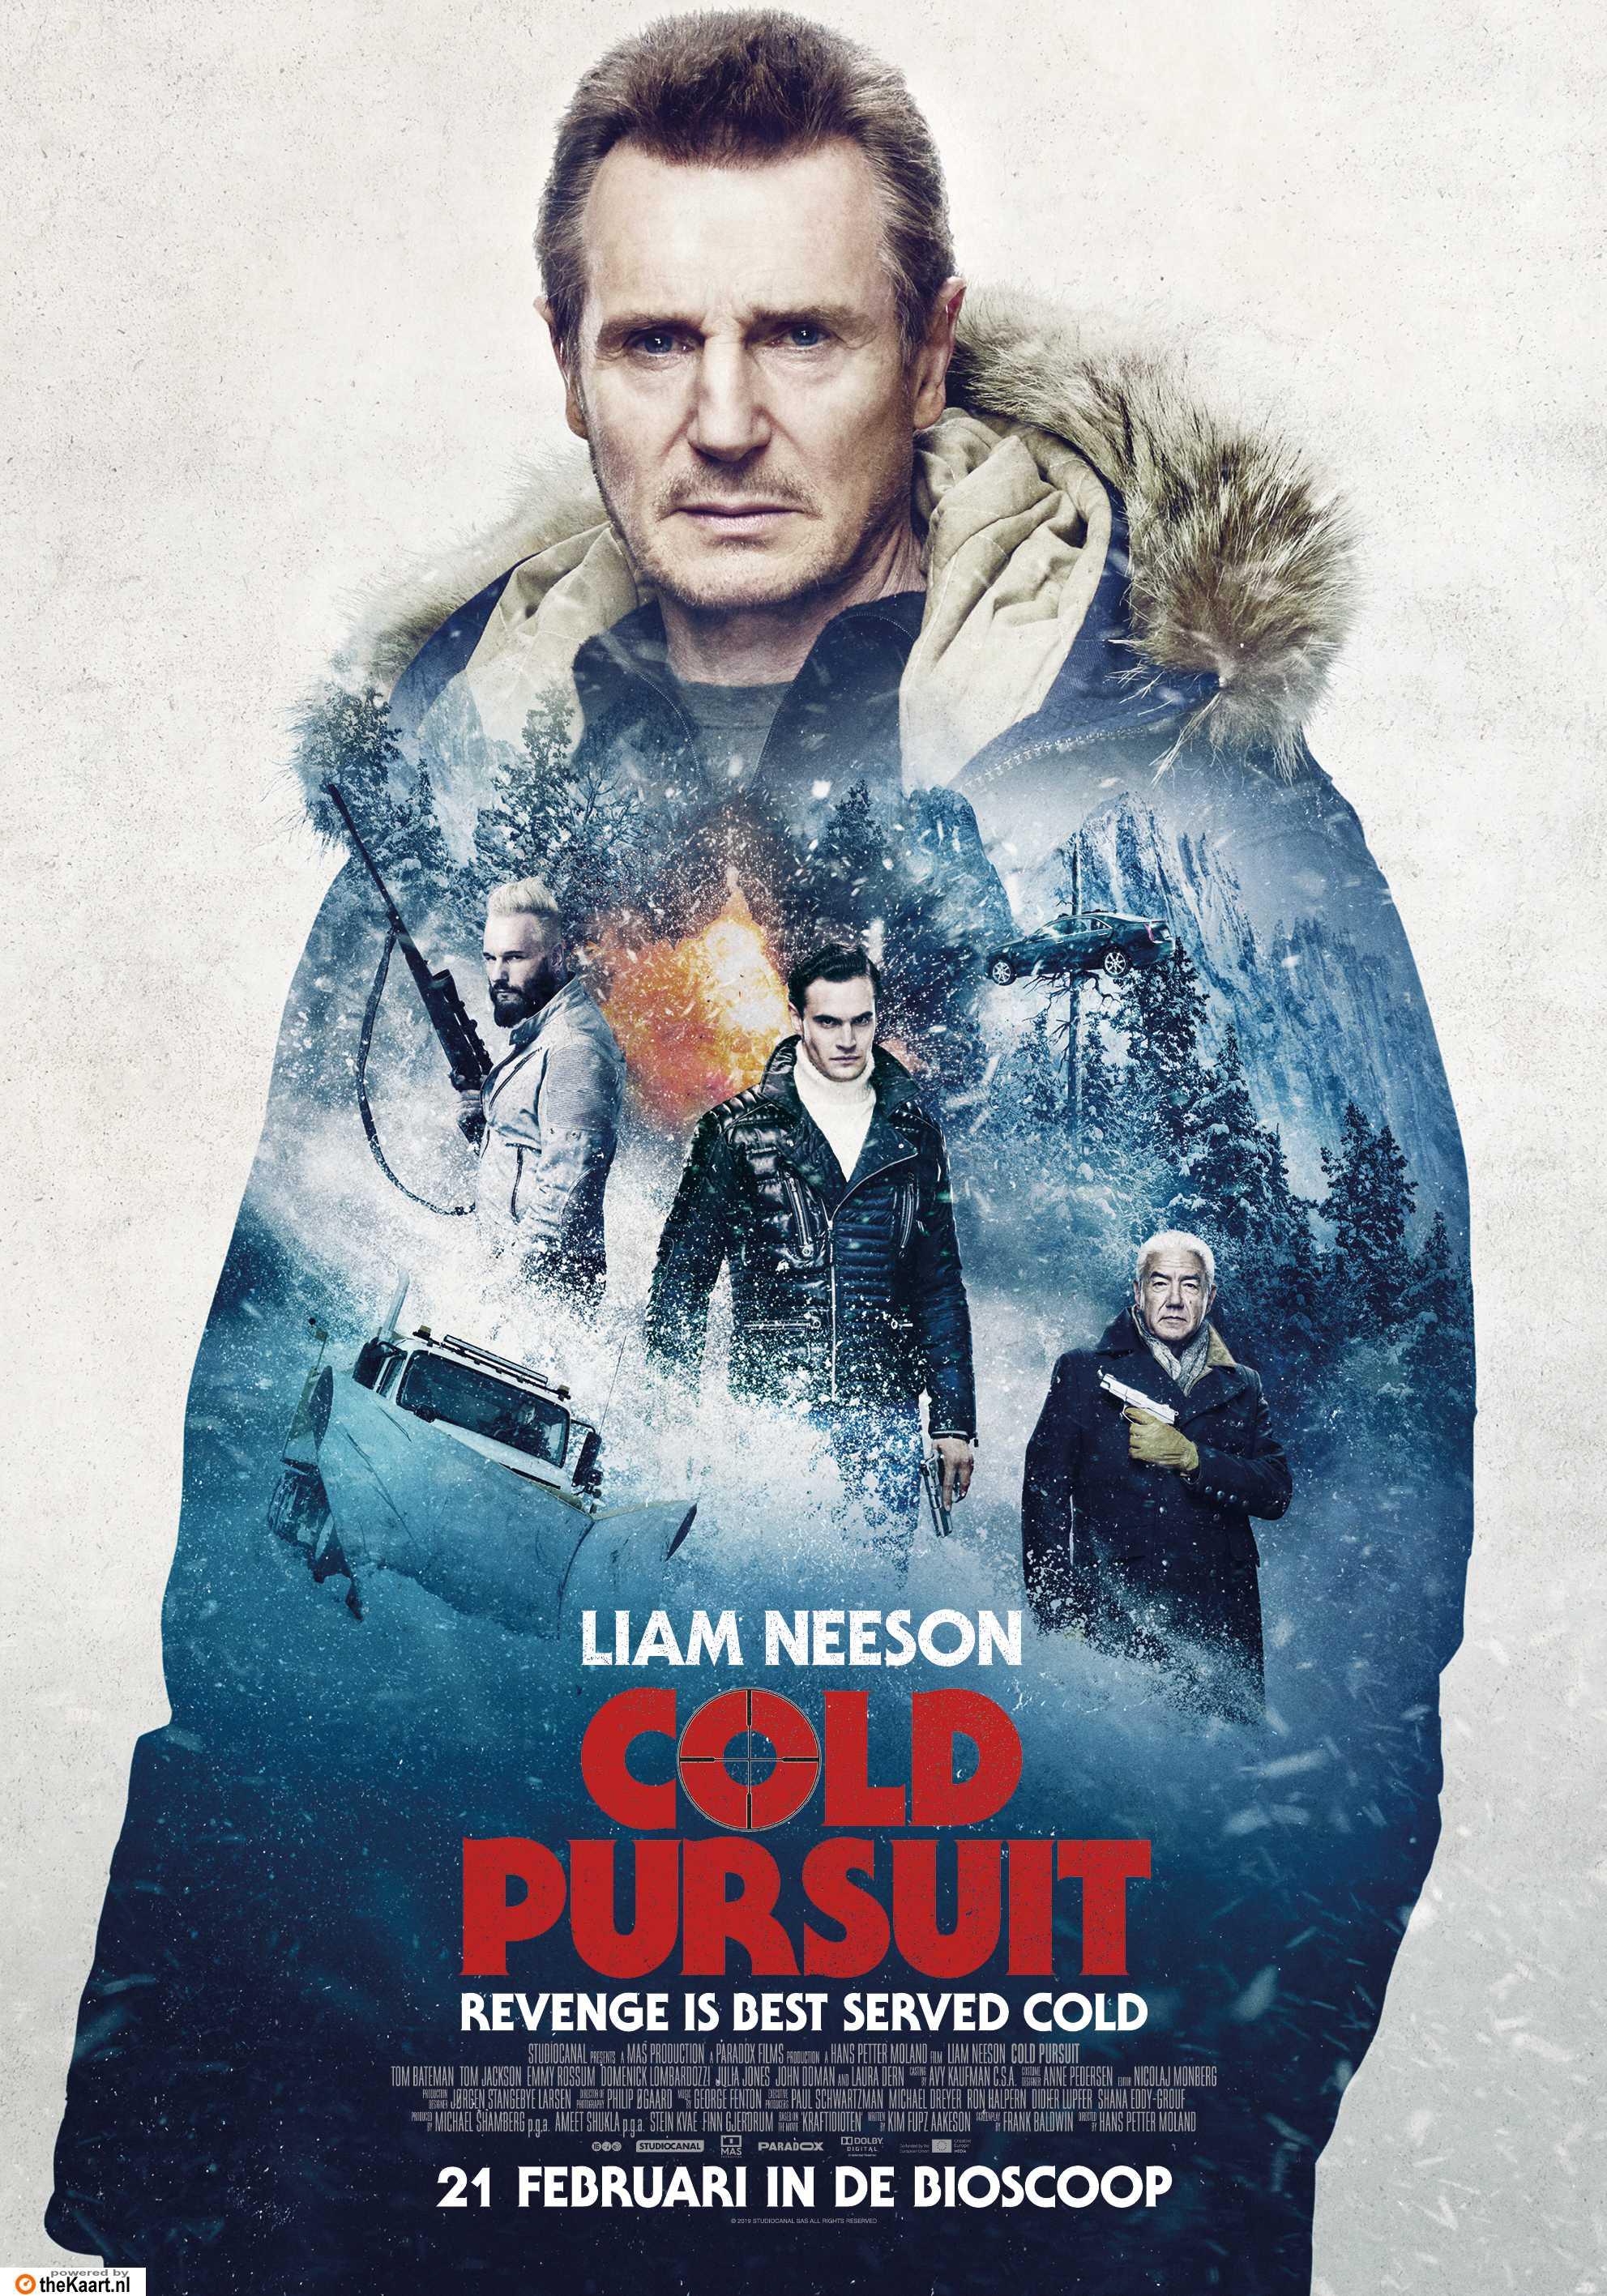 Cold Pursuit poster, © 2019 The Searchers